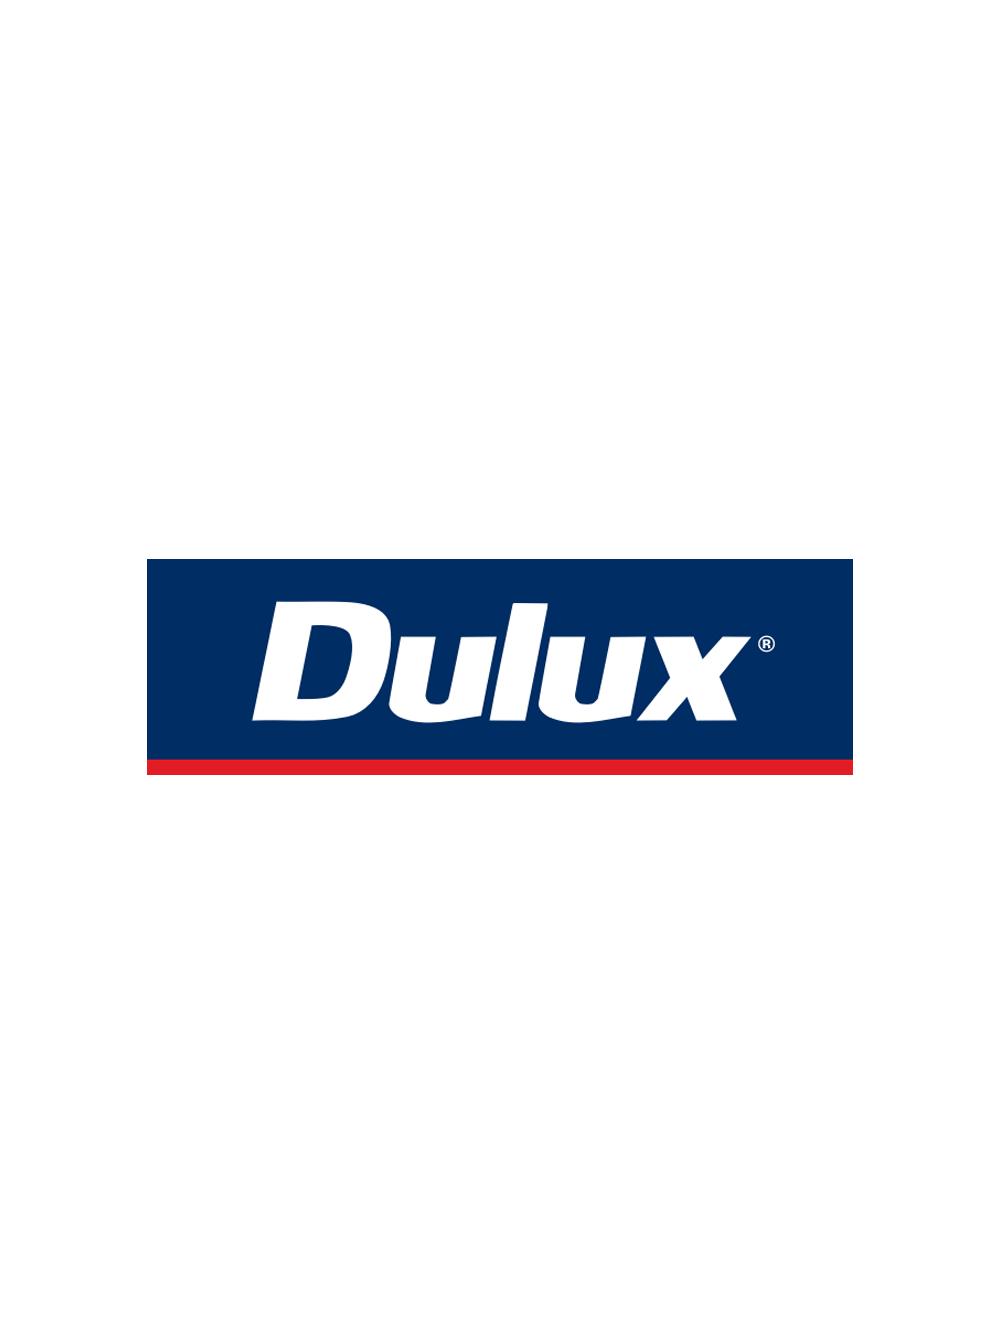 dulux_1000x1333.png